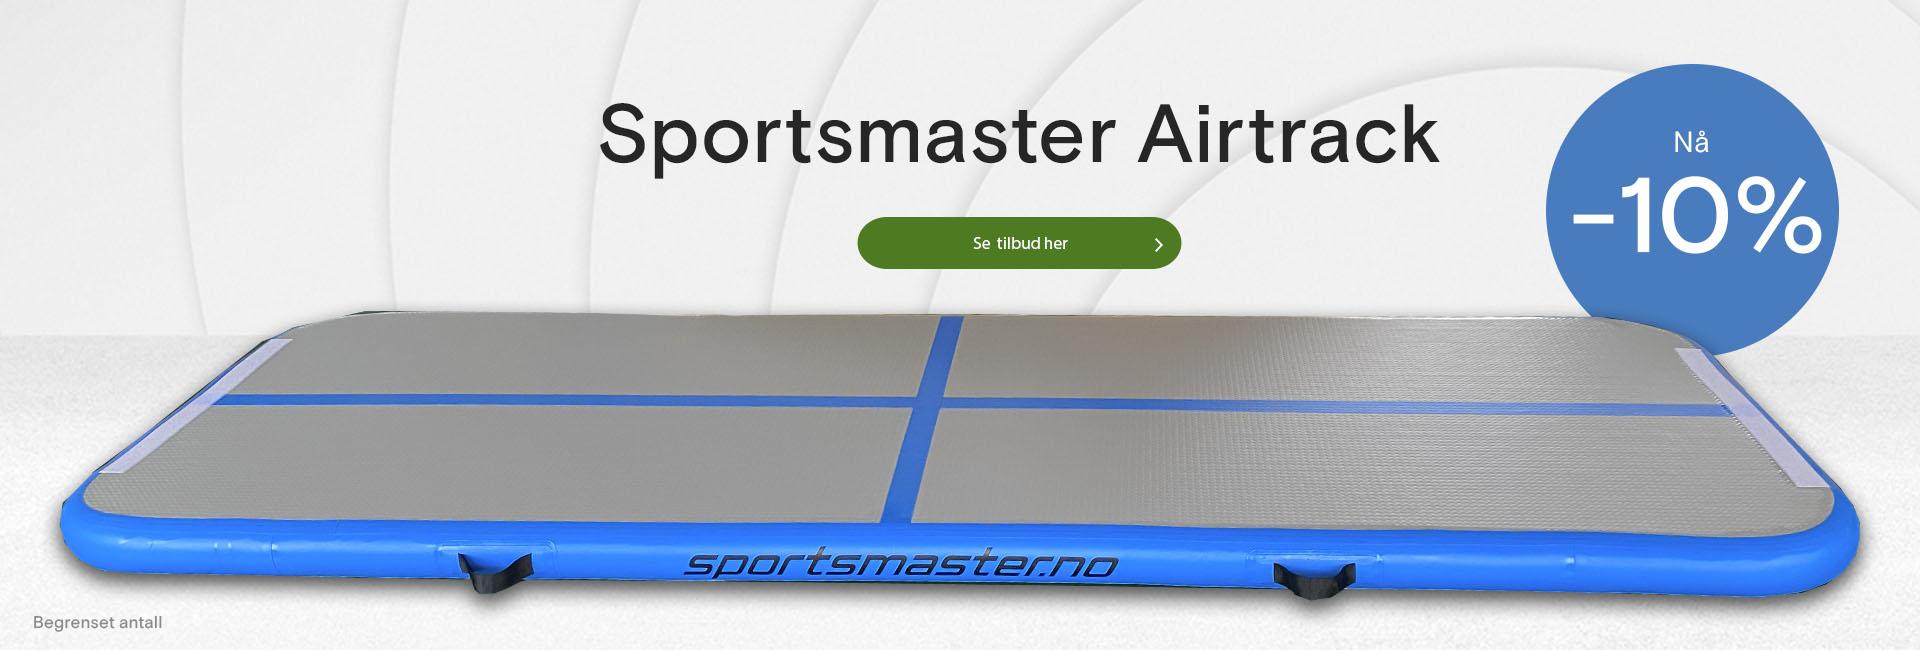 Sportsmaster airtrack